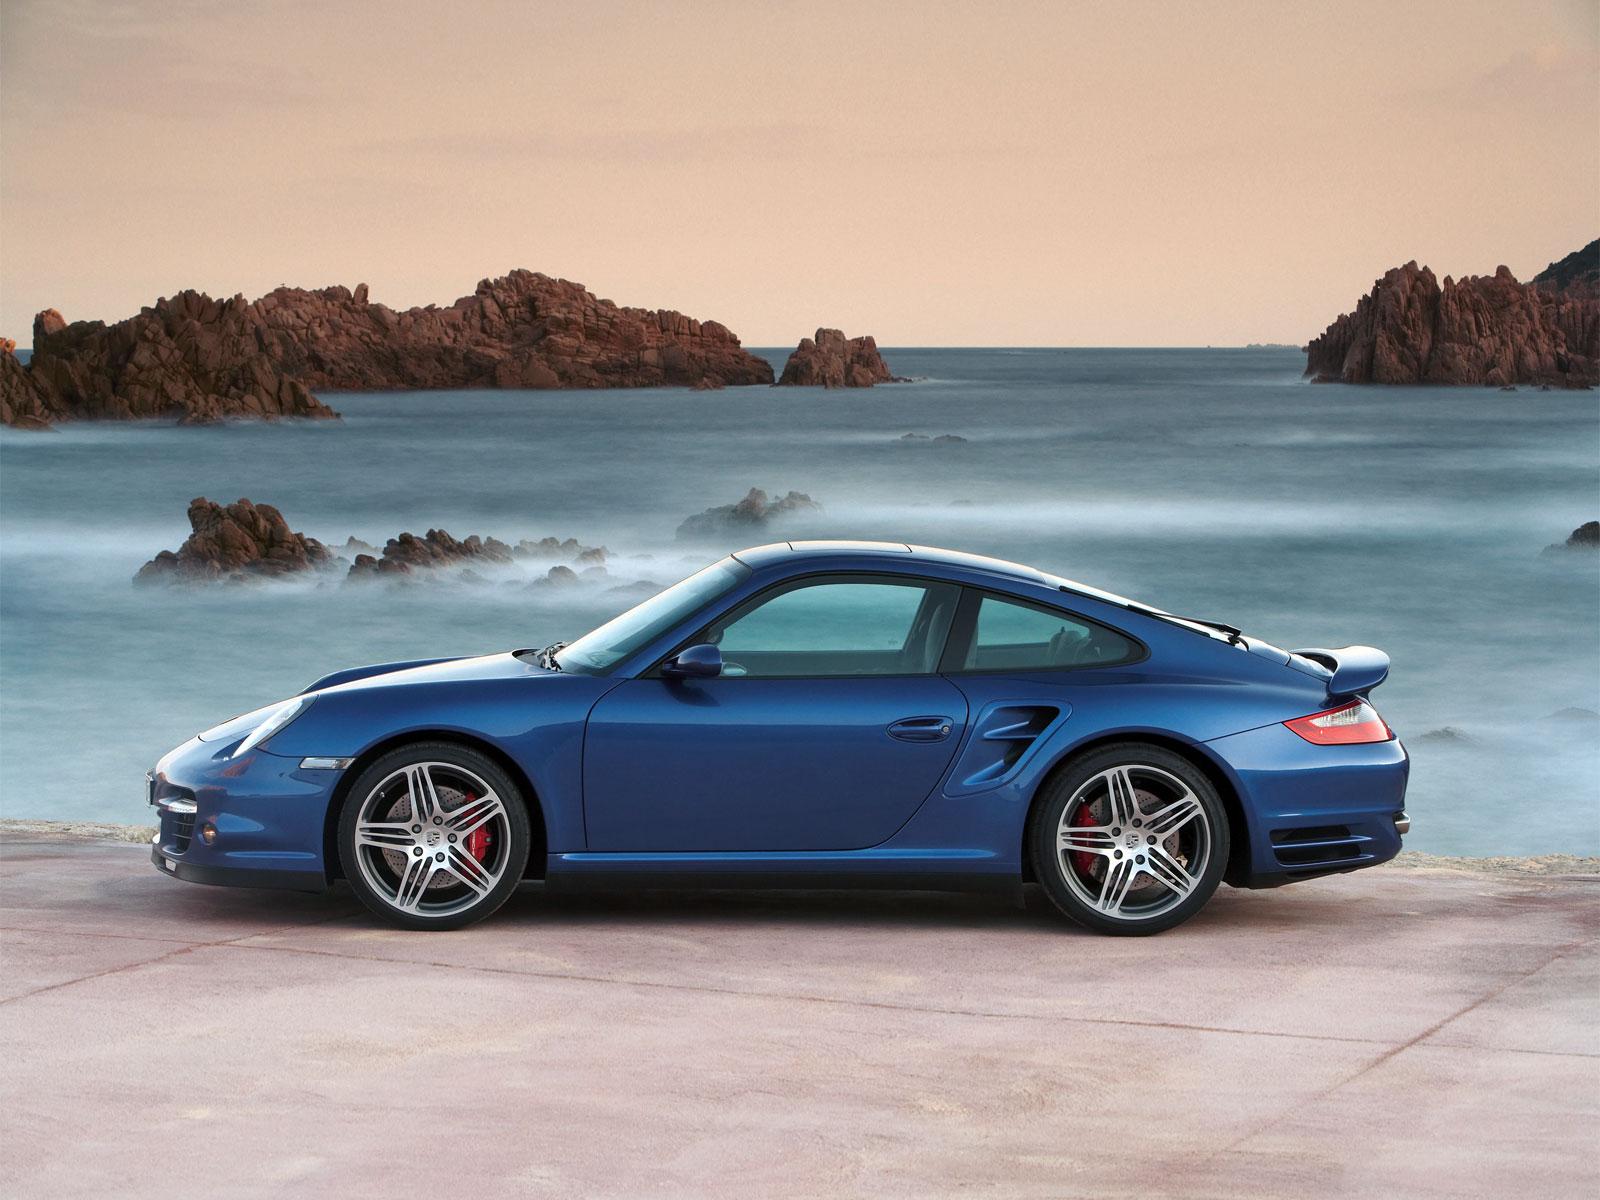 Exclusive porsche 911 porsche 911 turbo wallpapers 1600 1200